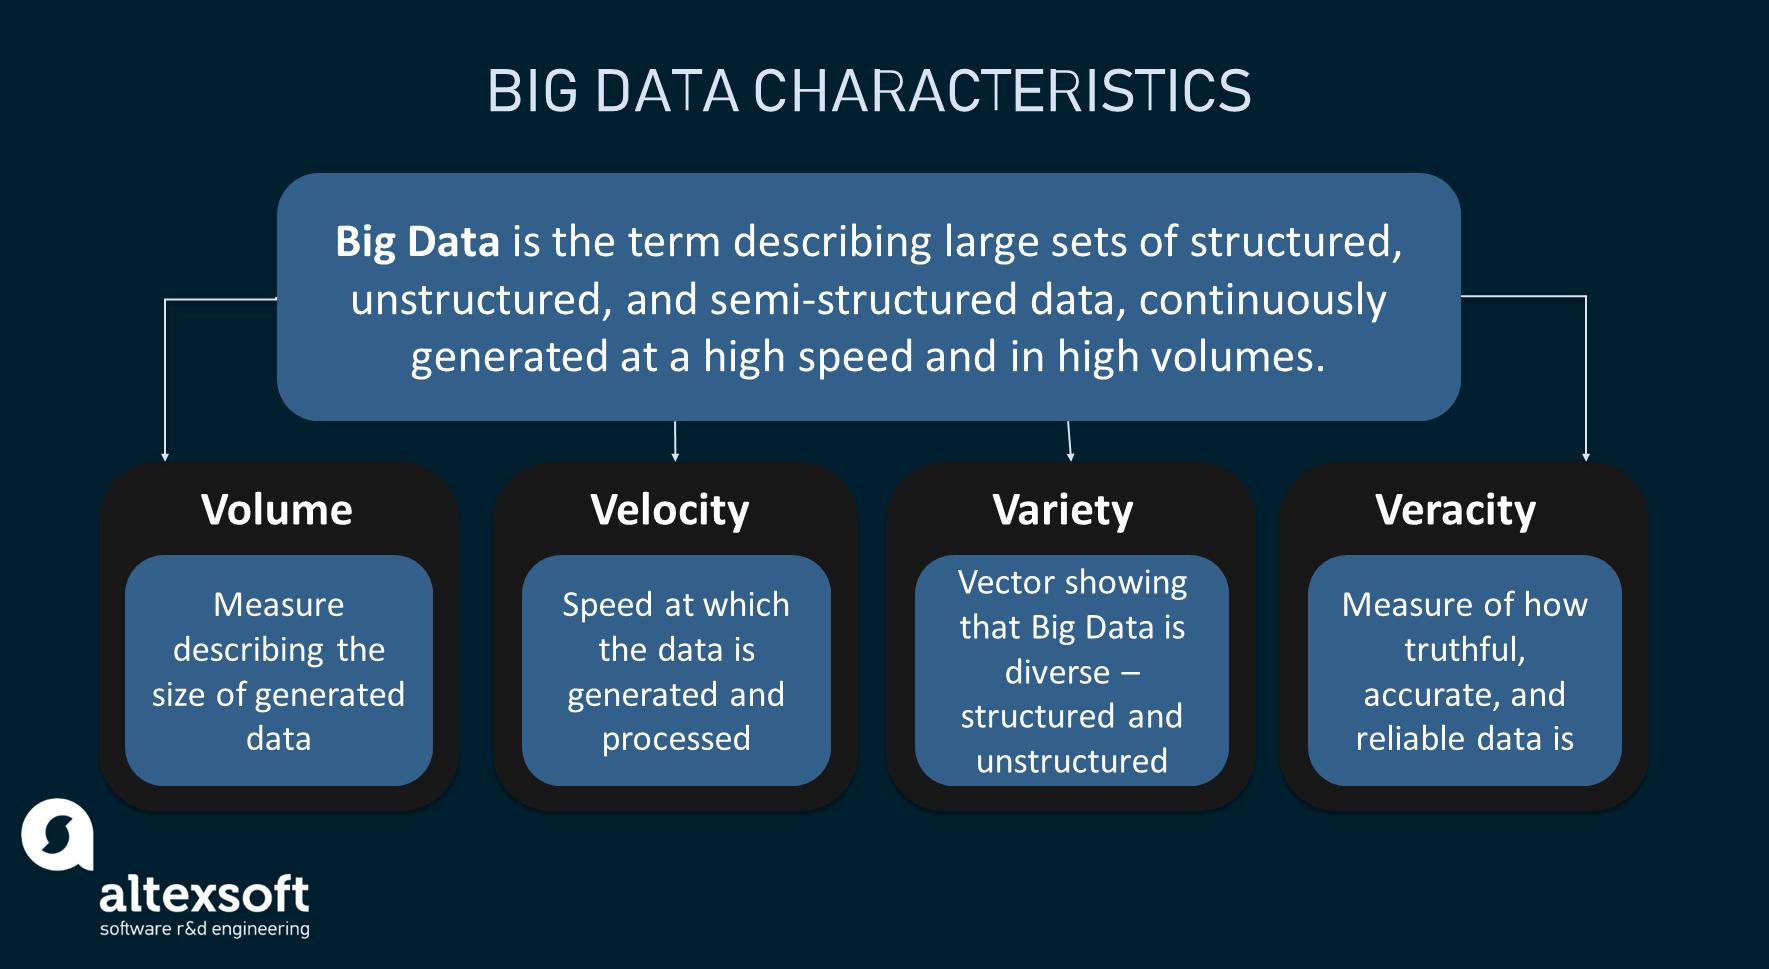 Key Big Data characteristics